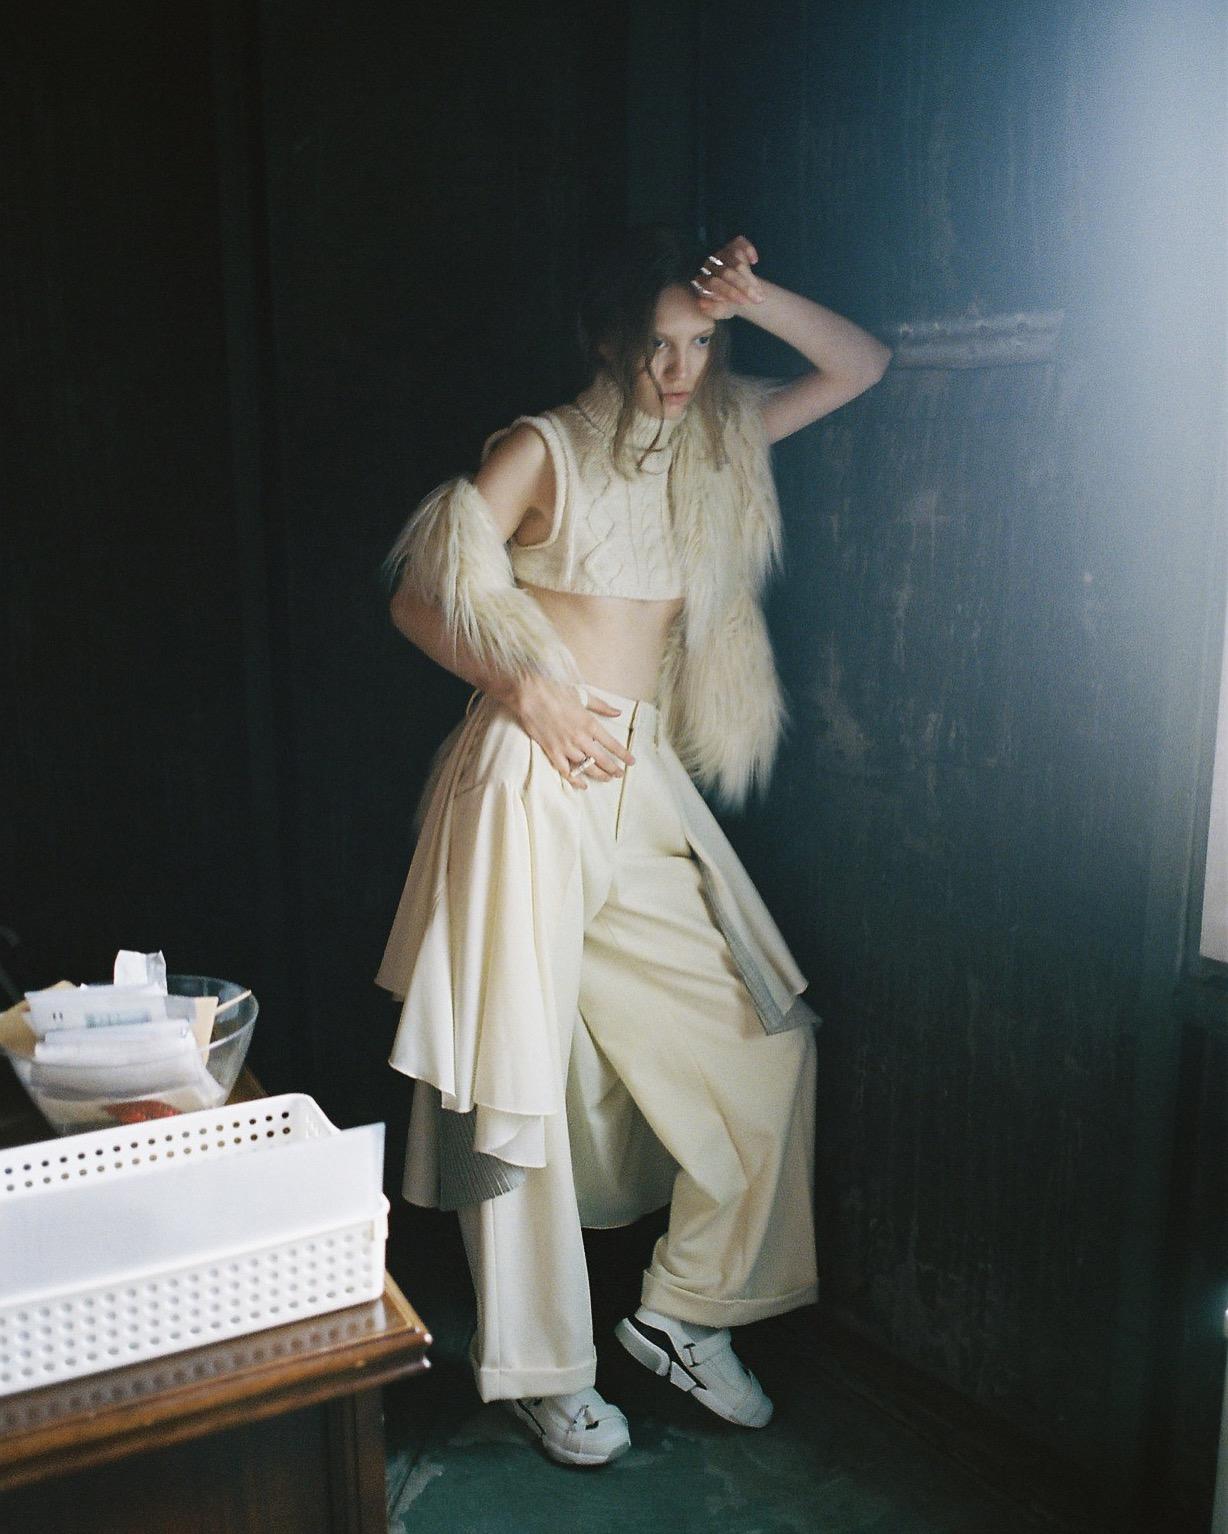 Her_Magazine_Jacob_Hodgkinson